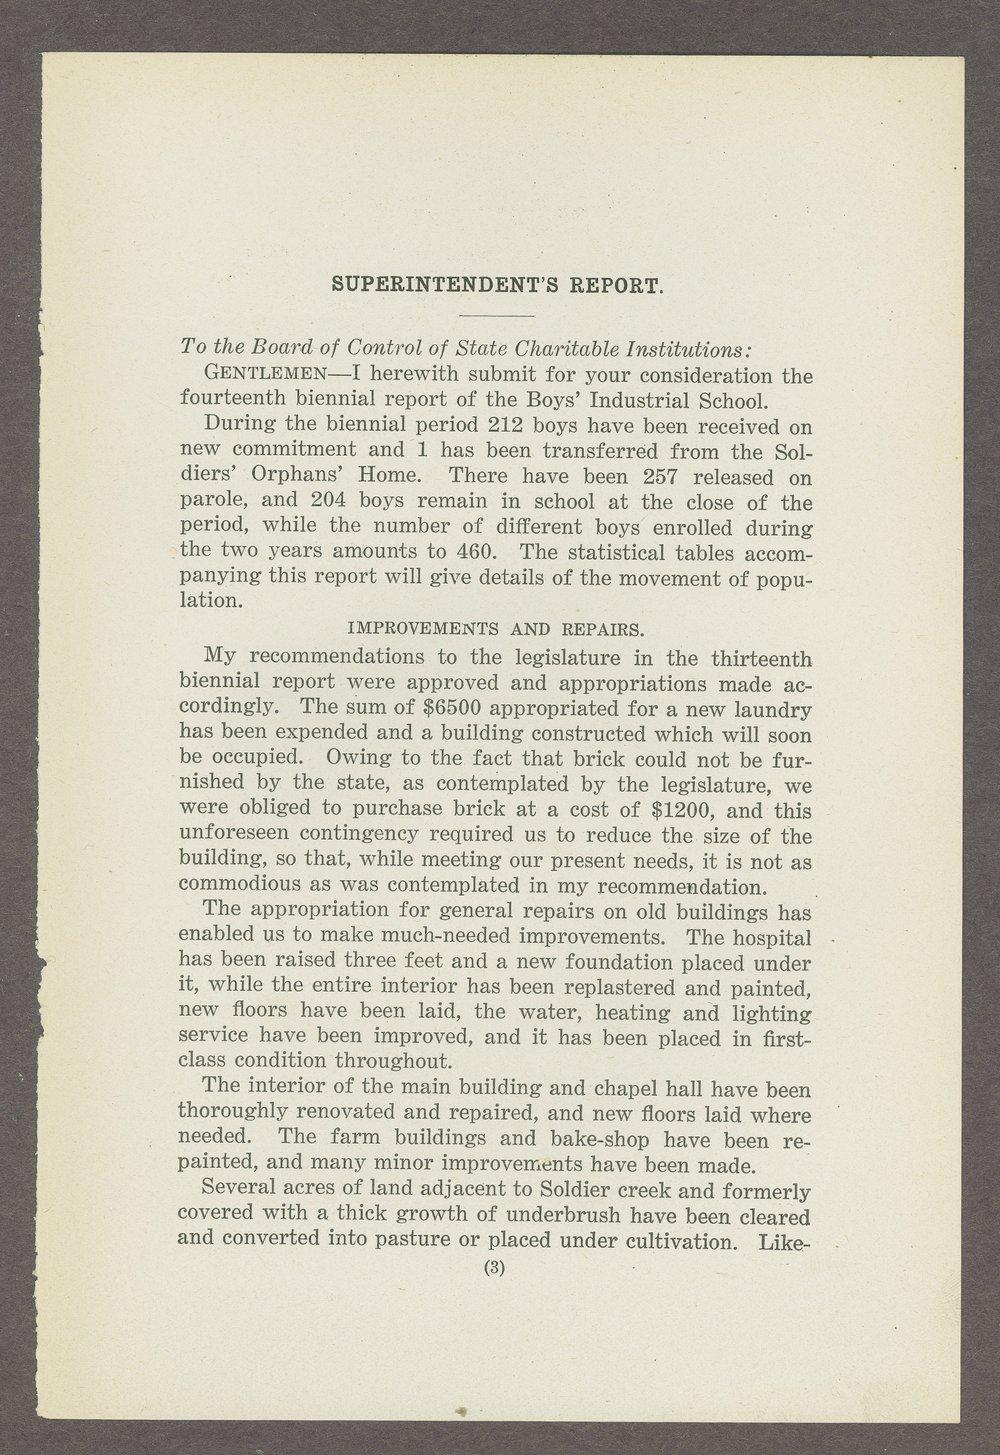 Biennial report of the Boys Industrial School, 1908 - 3